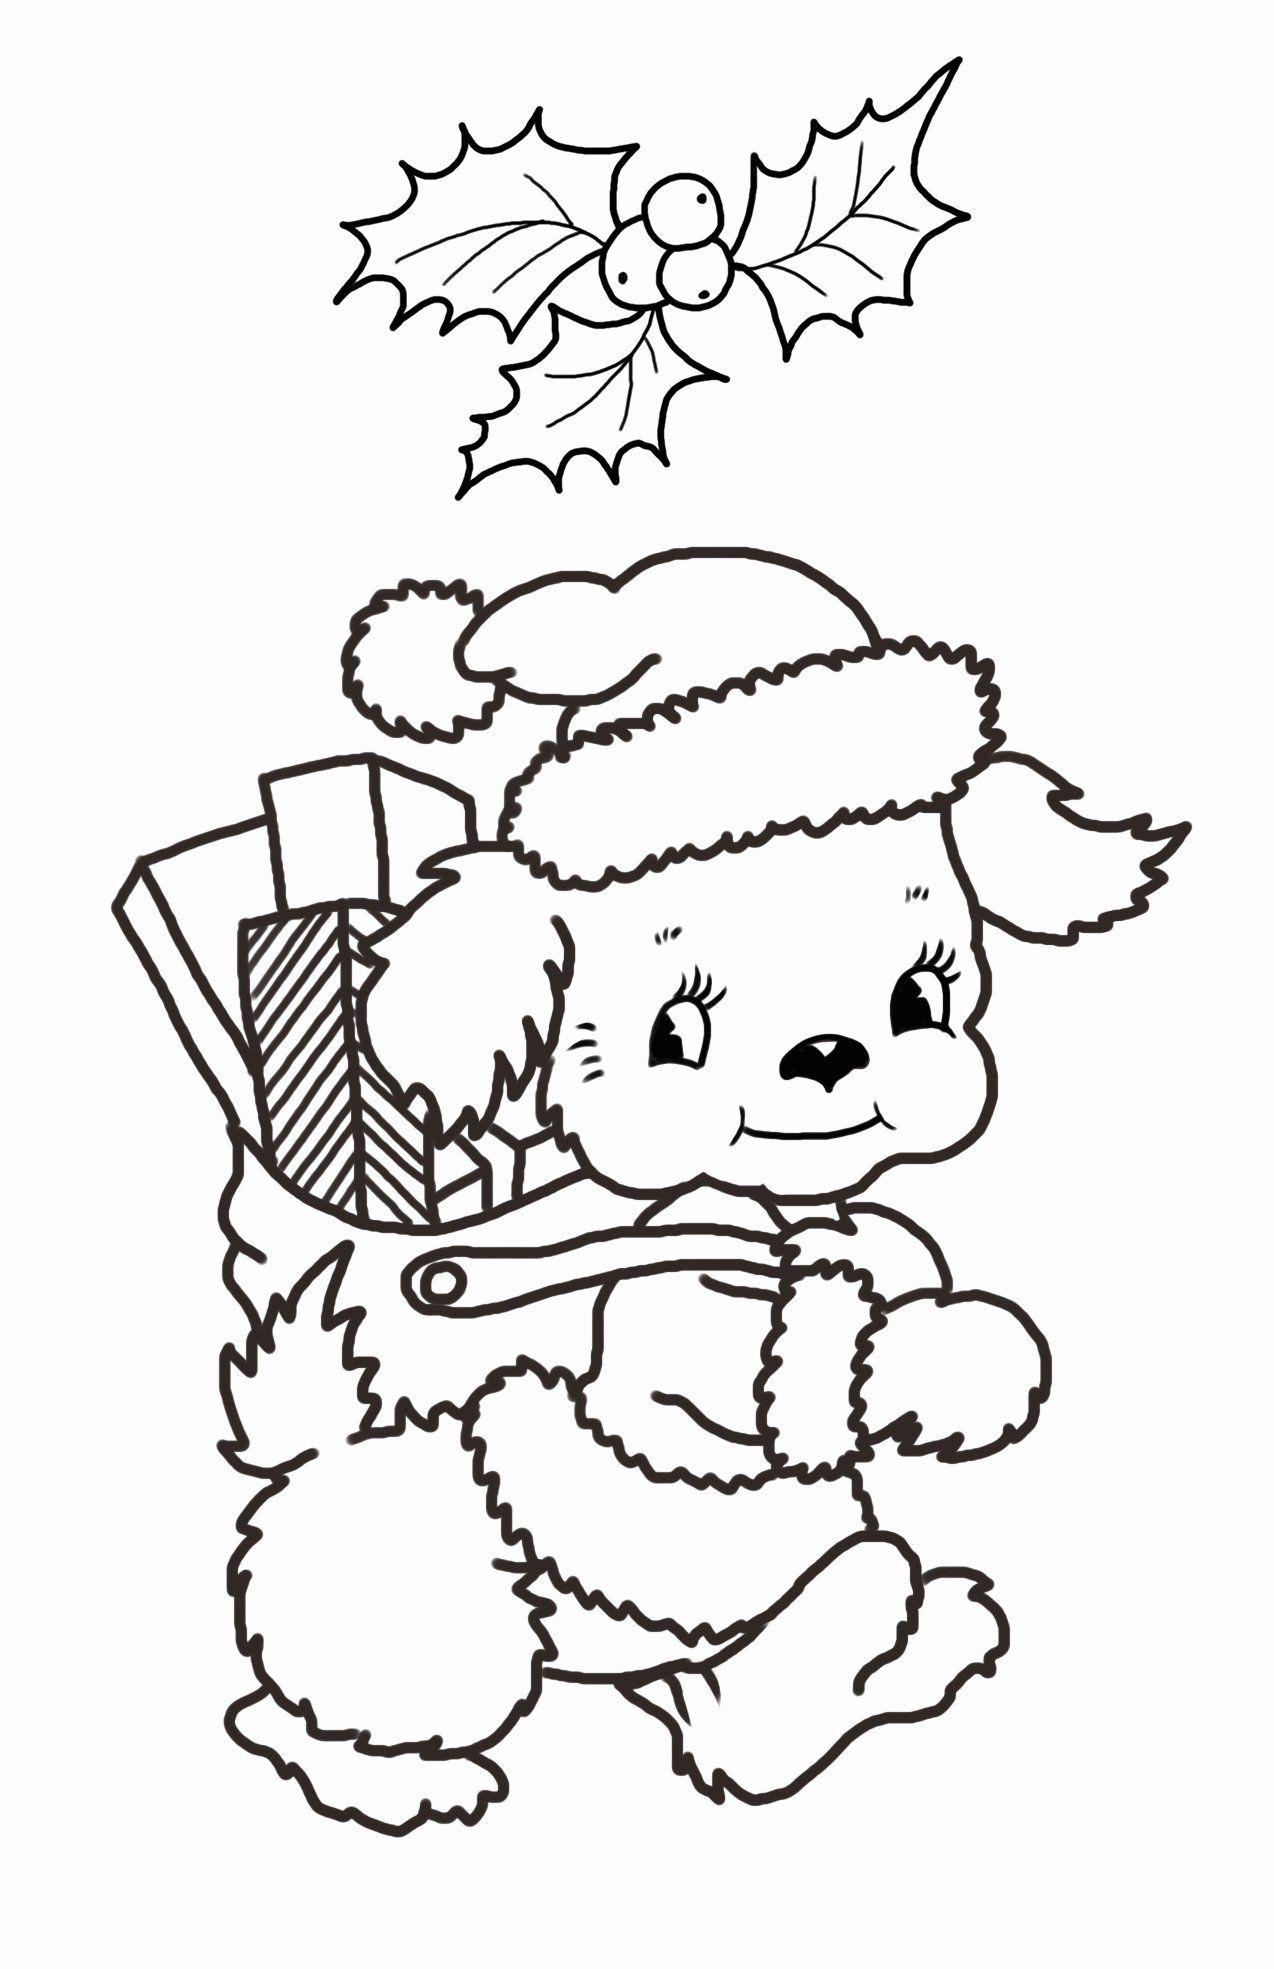 Christmas Puppy Coloring Sheet Fresh Christmas Coloring Pages In 2020 Santa Coloring Pages Christmas Coloring Pages Christmas Drawing